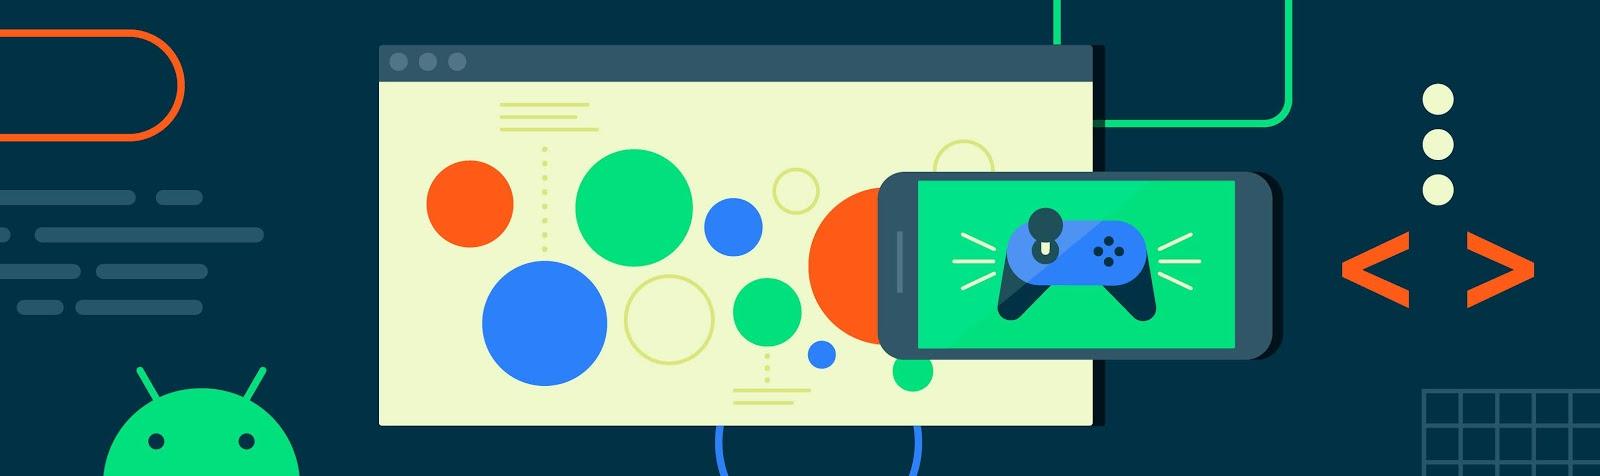 由Android Performance Tuner提供支持的游戏性能洞察力